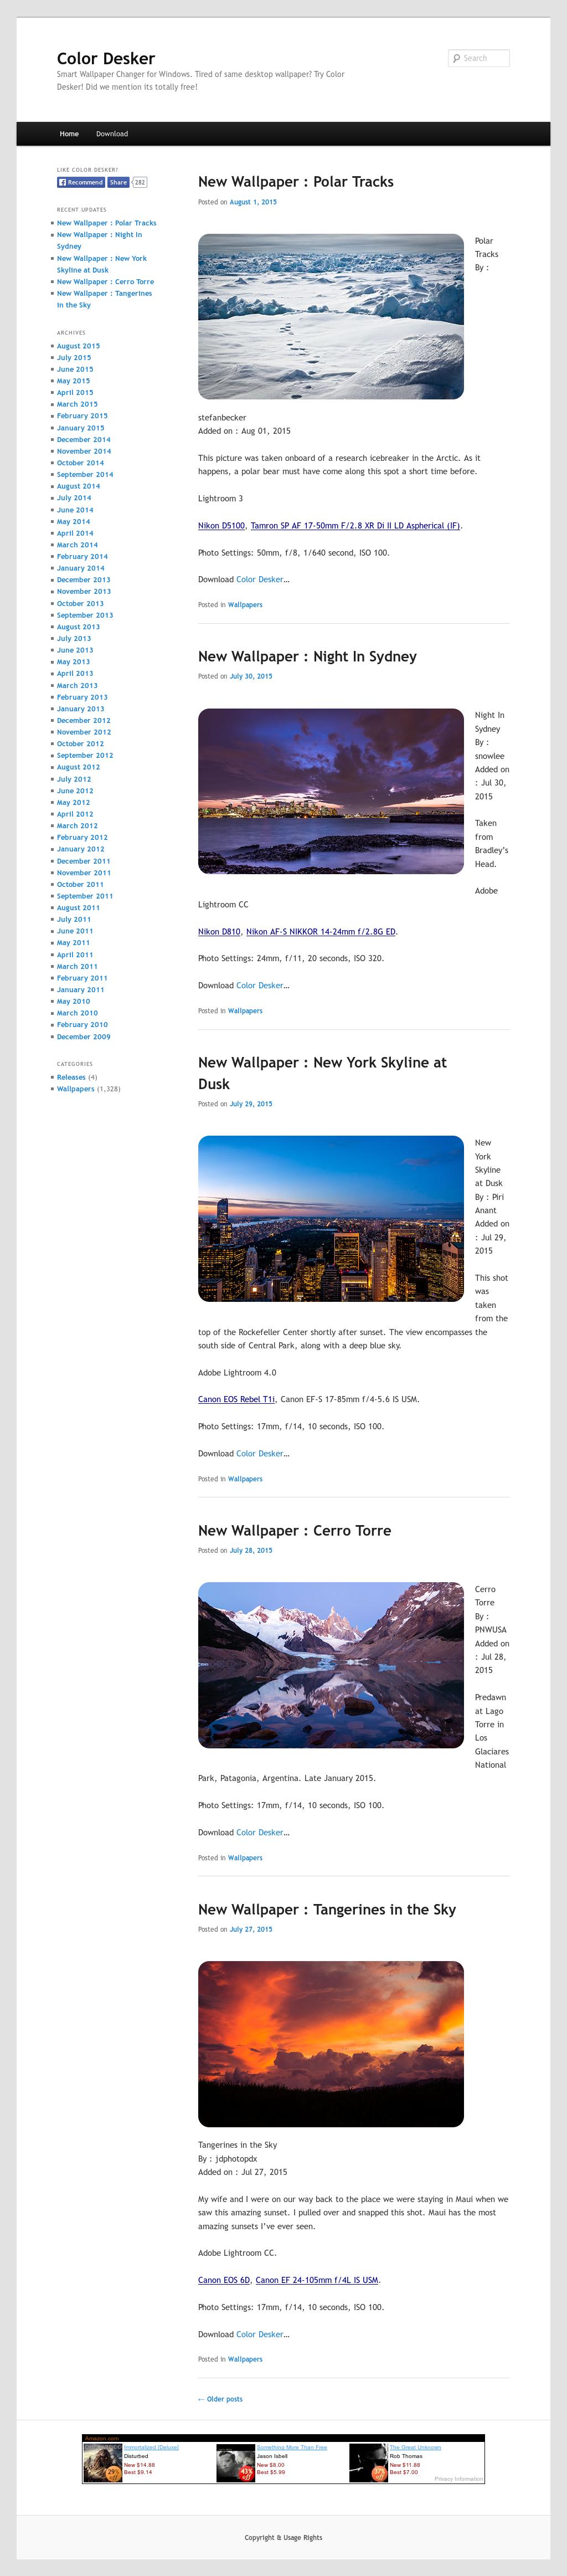 Enjoyable Color Desker Competitors Revenue And Employees Owler Download Free Architecture Designs Scobabritishbridgeorg